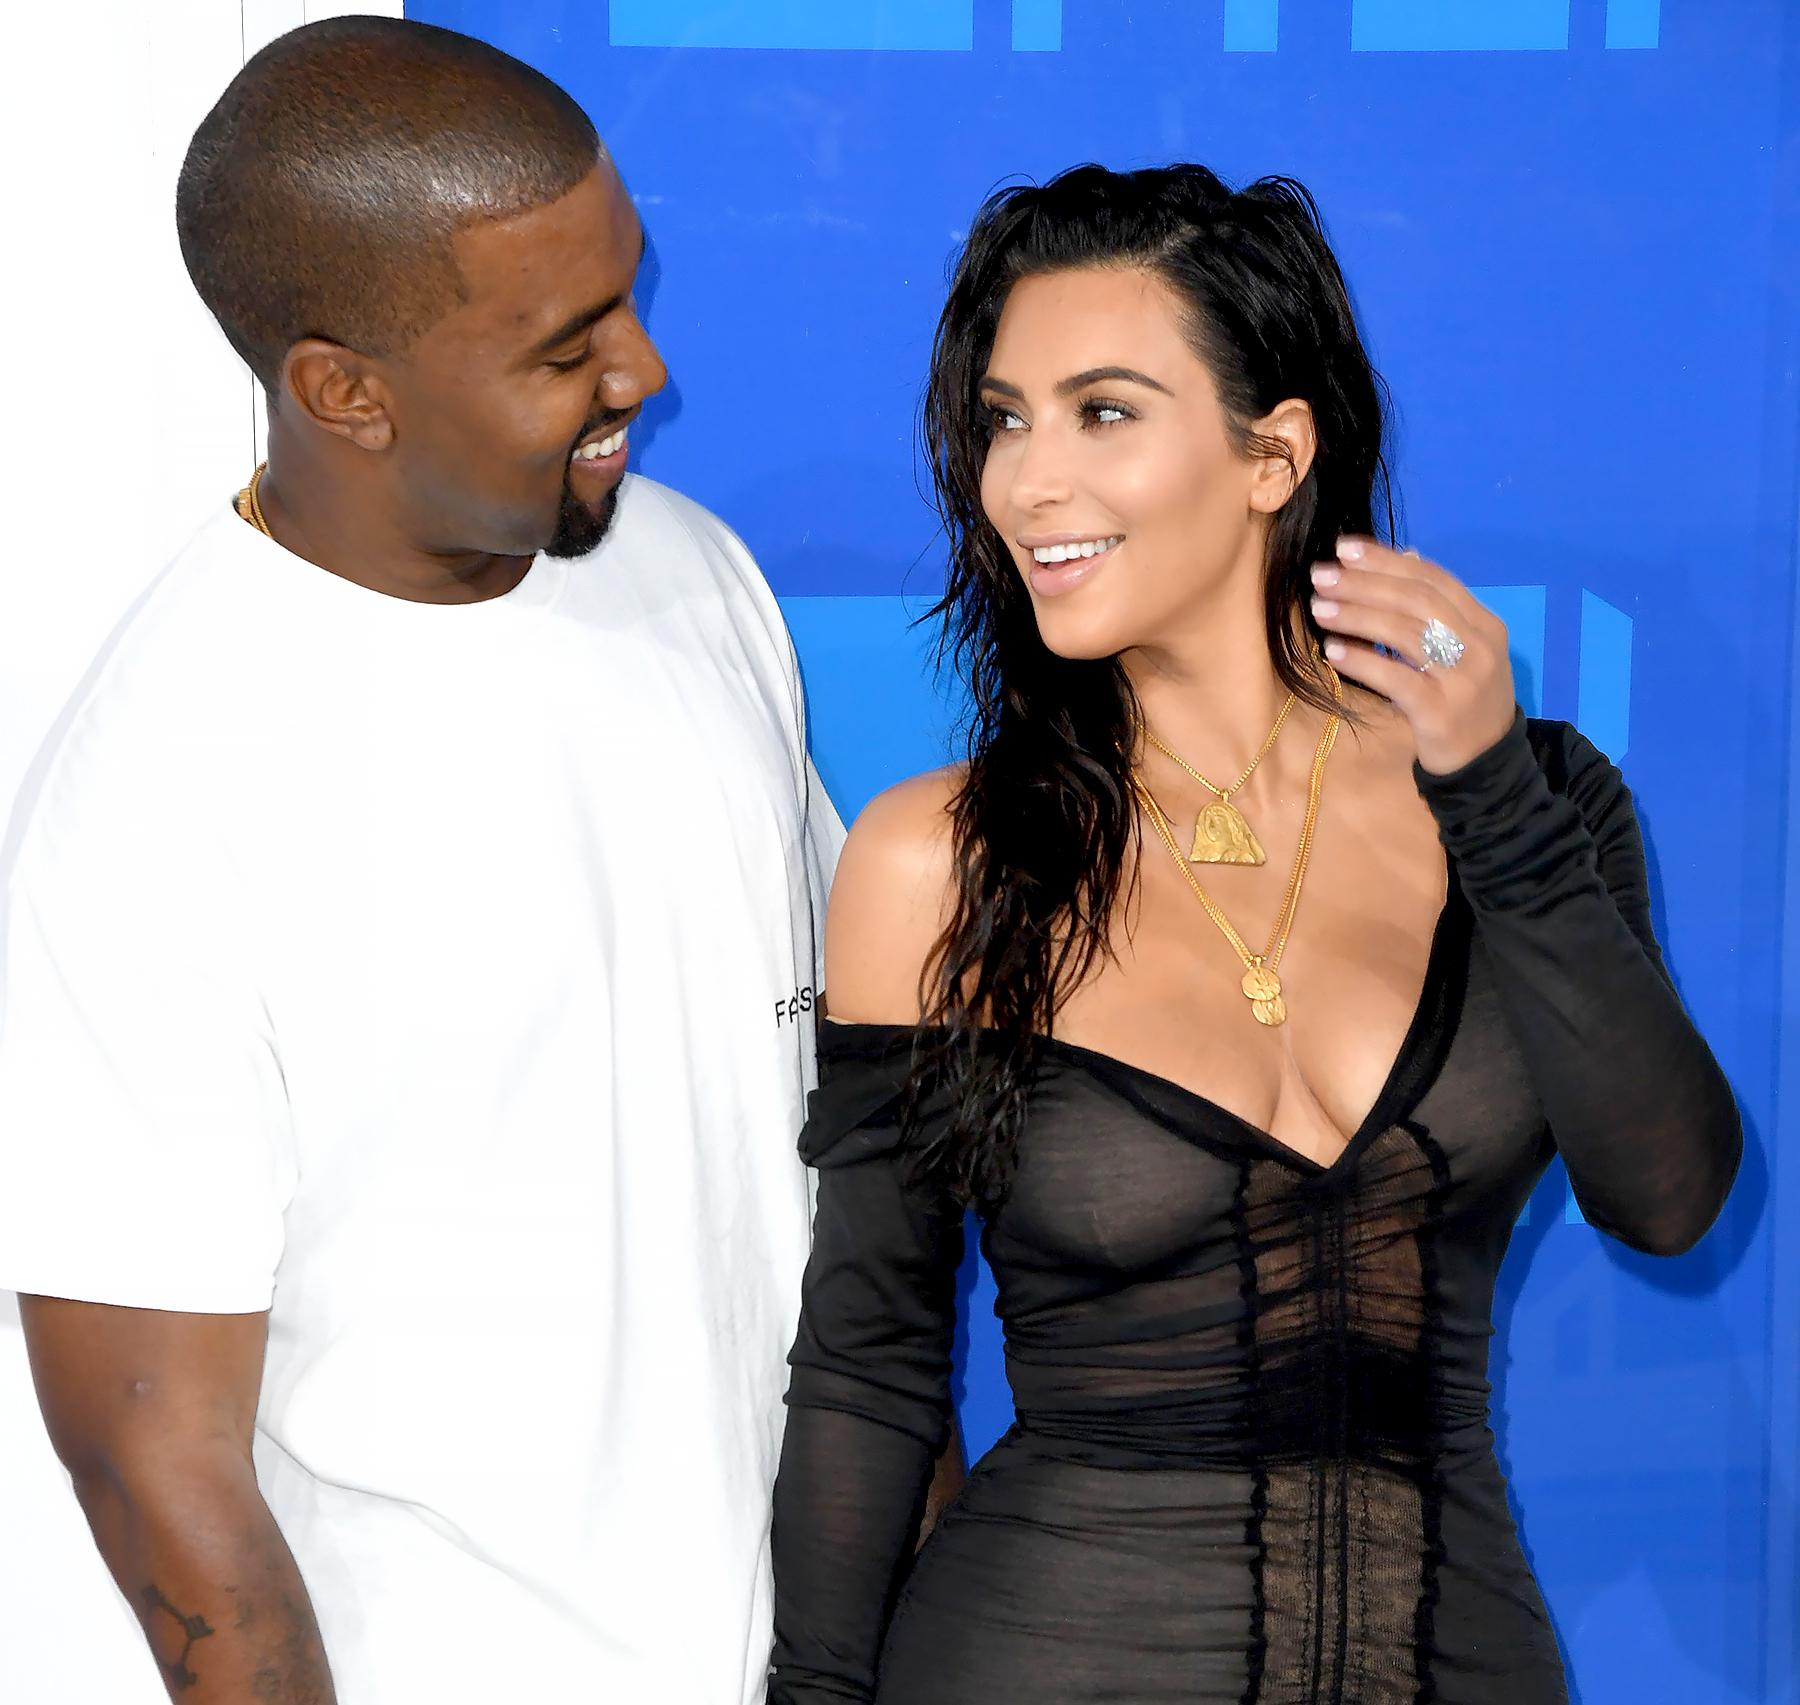 Kim Kardashian and Kanye West arrive for the 2016 MTV Video Music Awards.